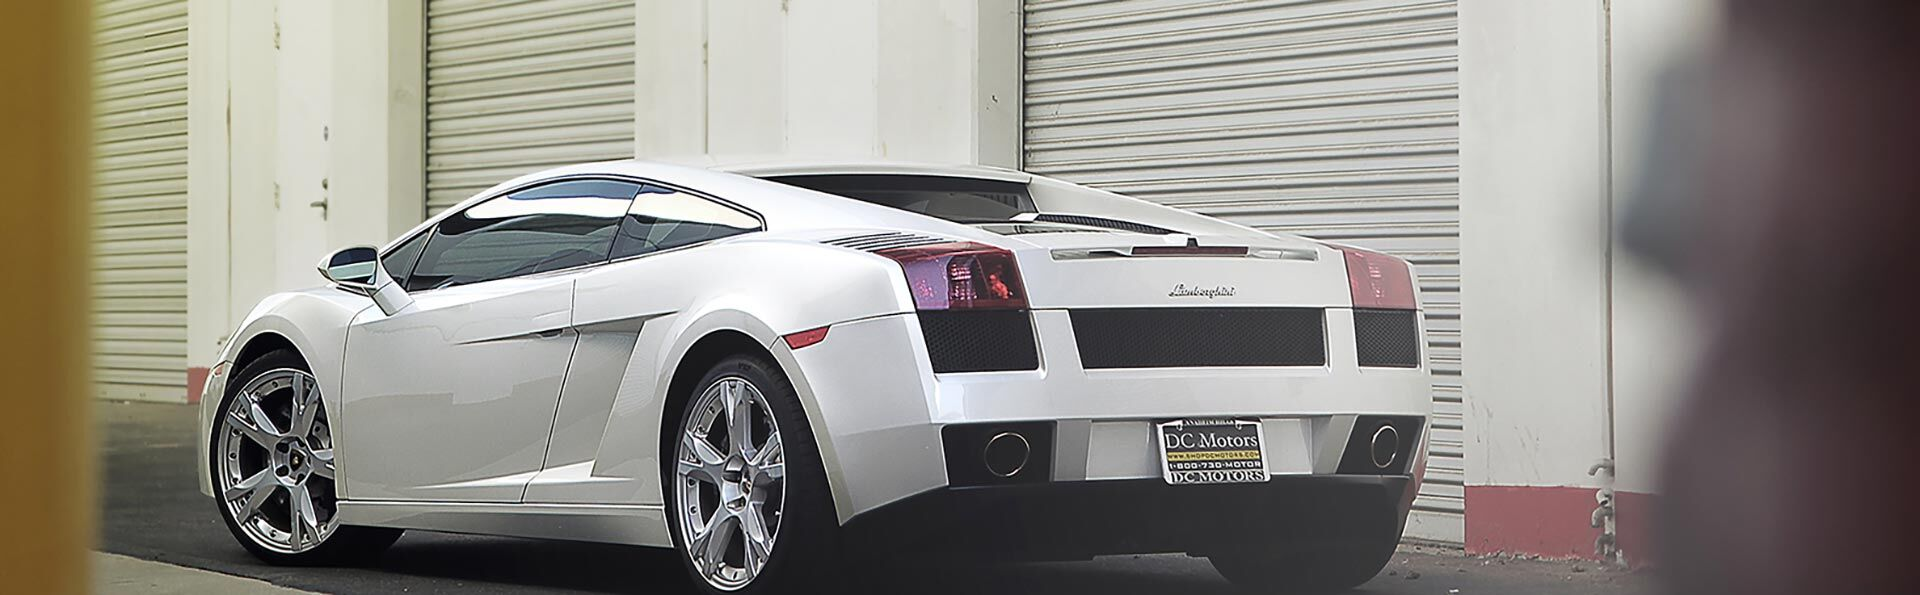 Used Car Dealership Anaheim Hills Ca Dc Motors